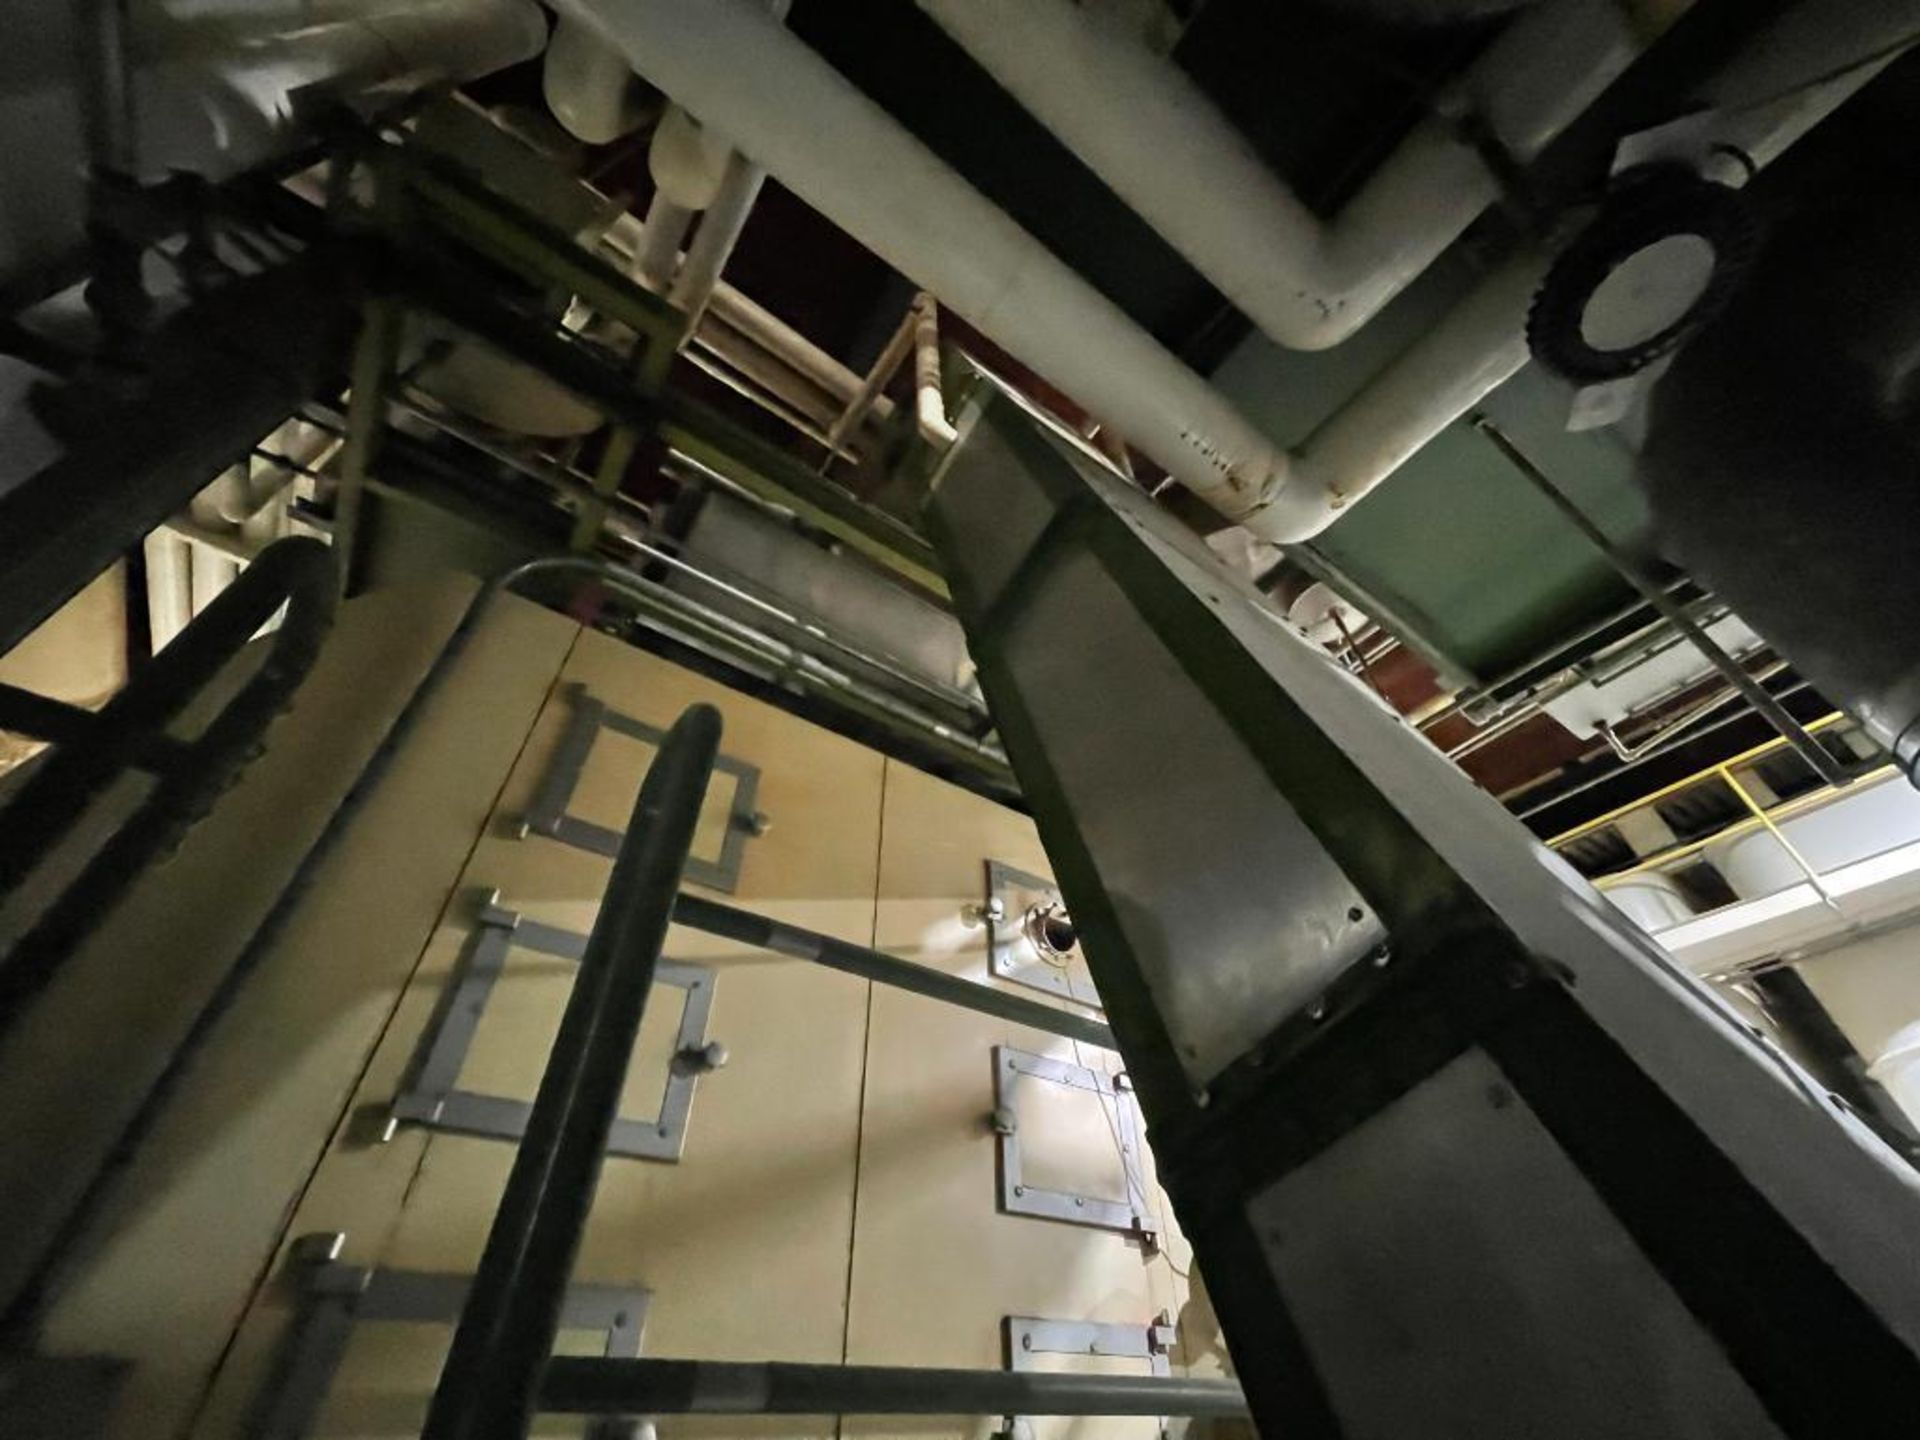 mild steel incline overlapping bucket conveyor - Image 6 of 7